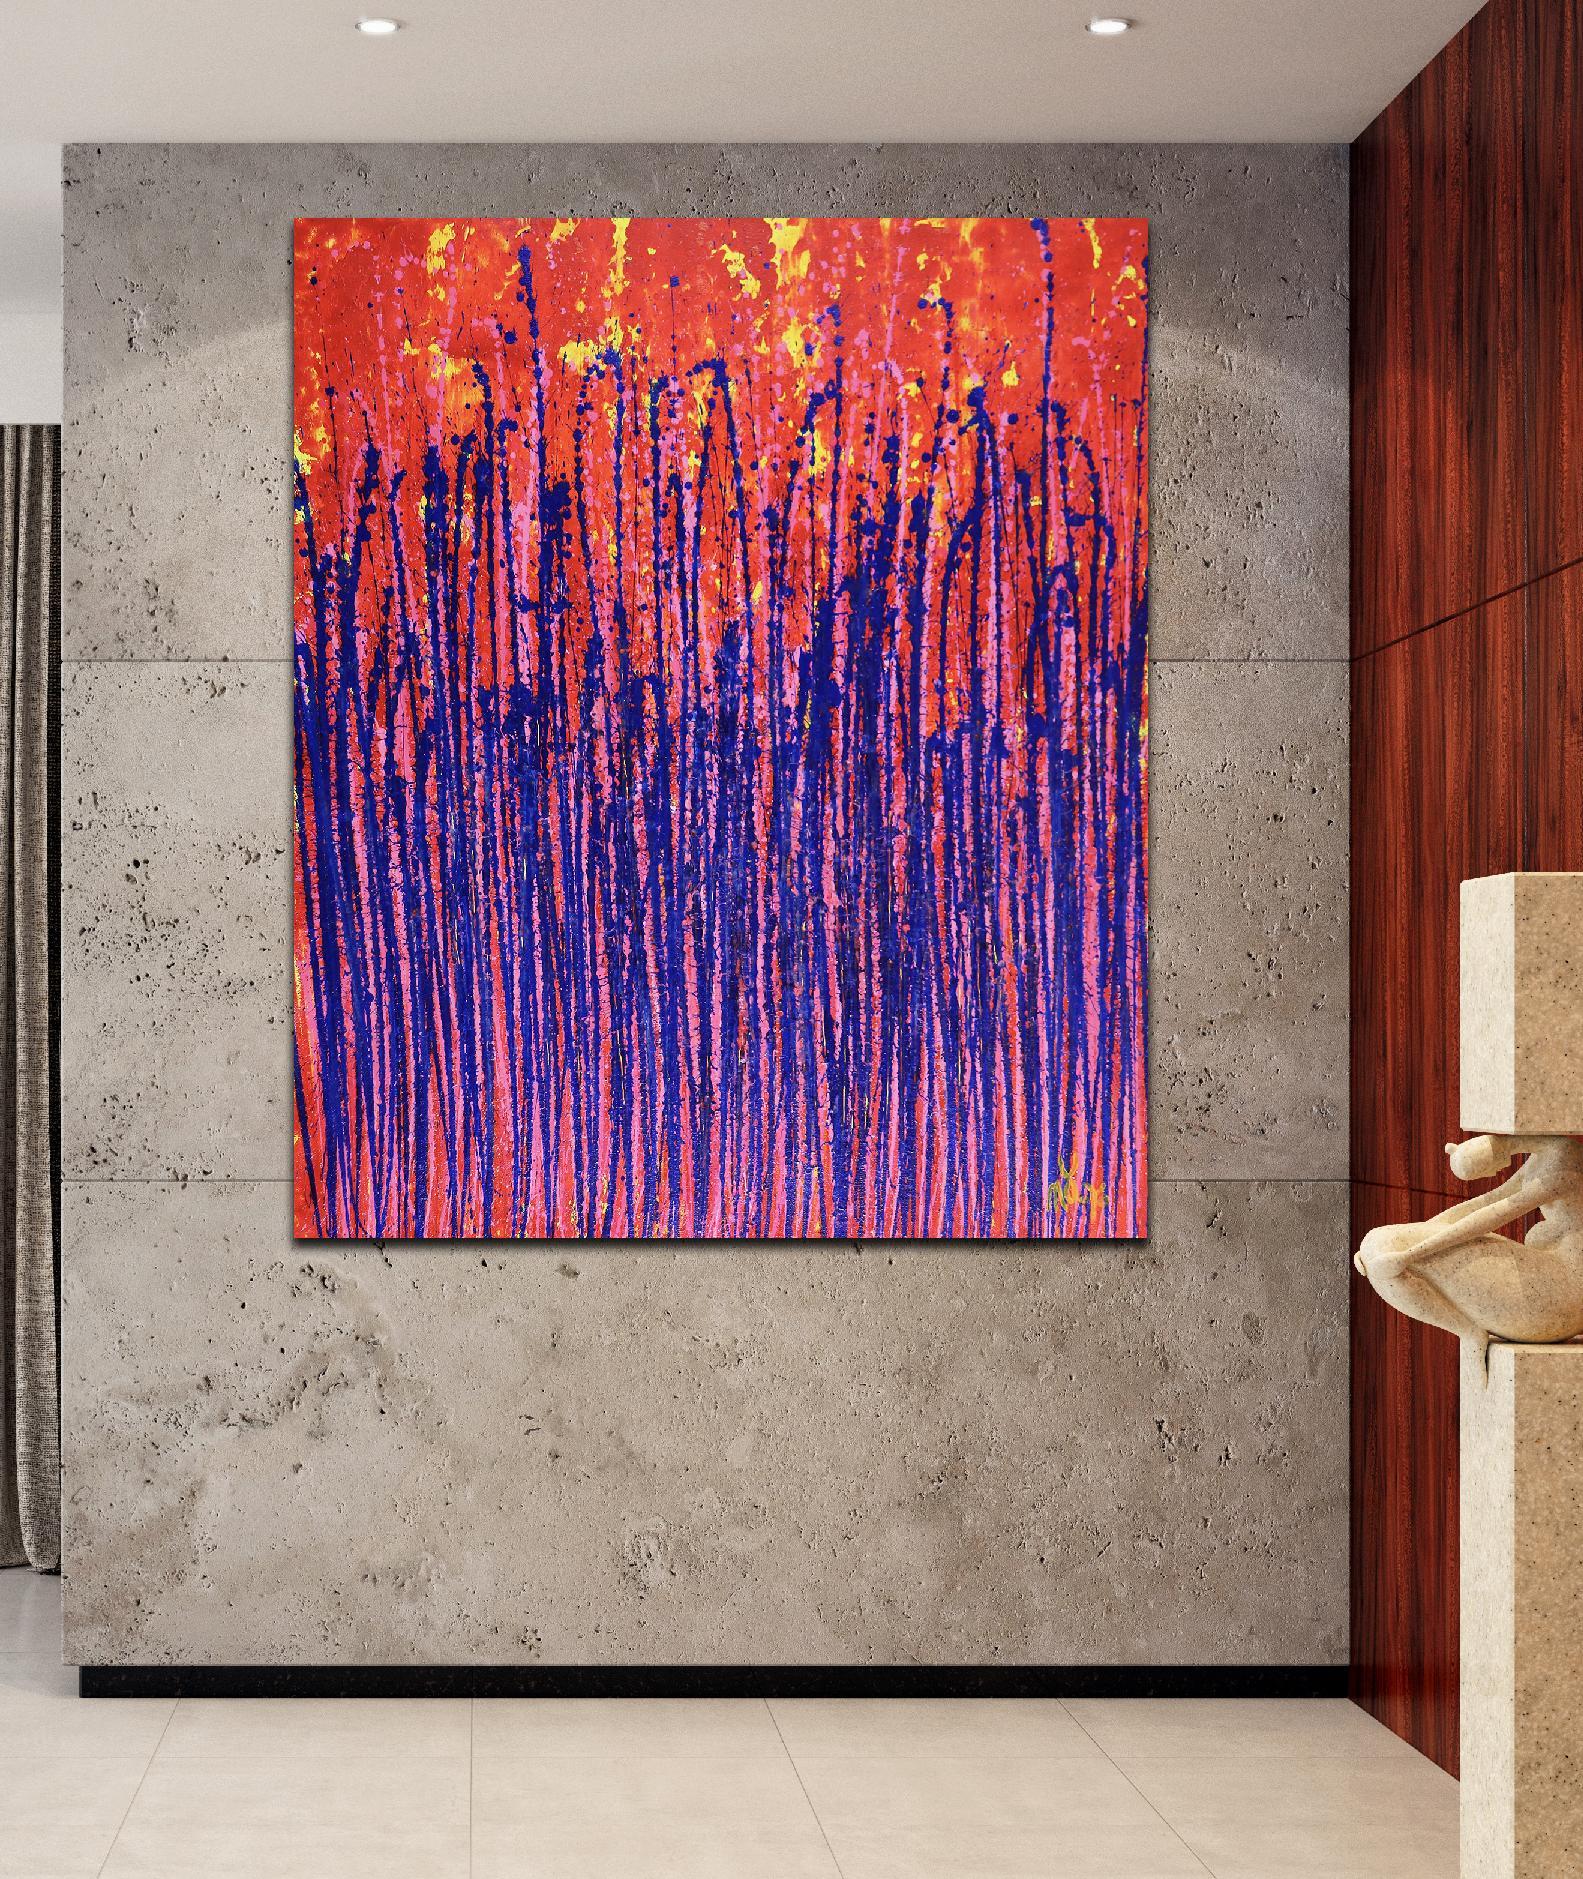 Room View - Daring Spectra #3 (2020) by Nestor Toro